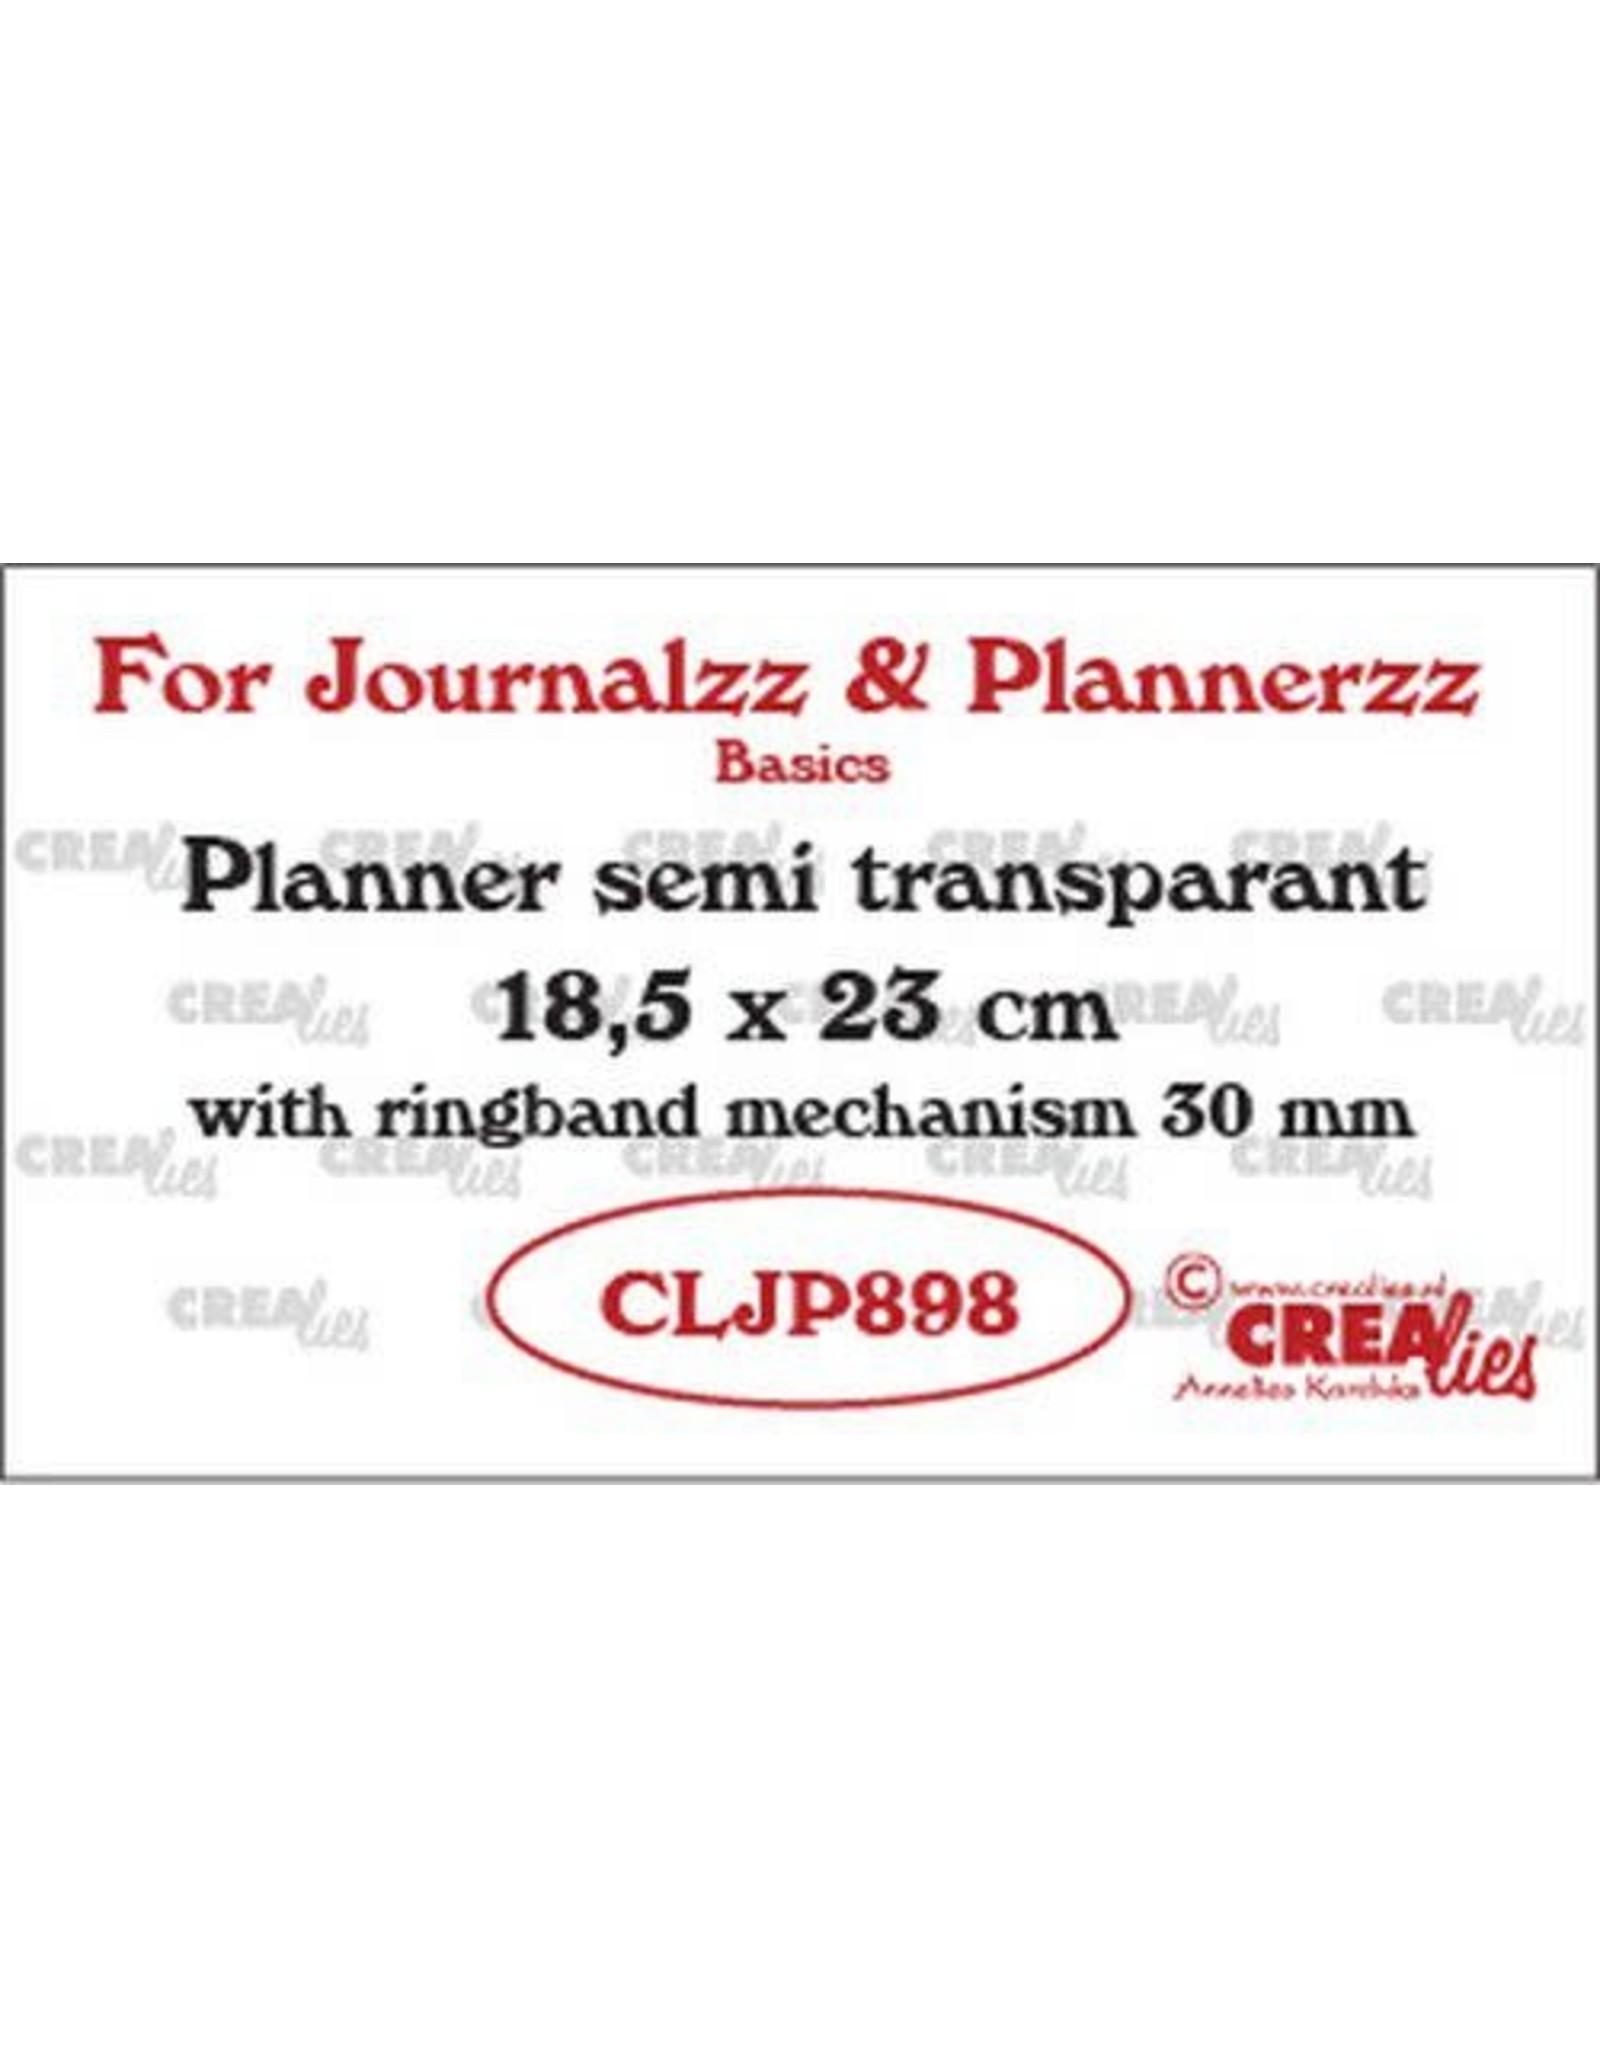 Crealies Crealies Journalzz & Pl Planner semi transparant CLJP898 18,5 x 23 cm